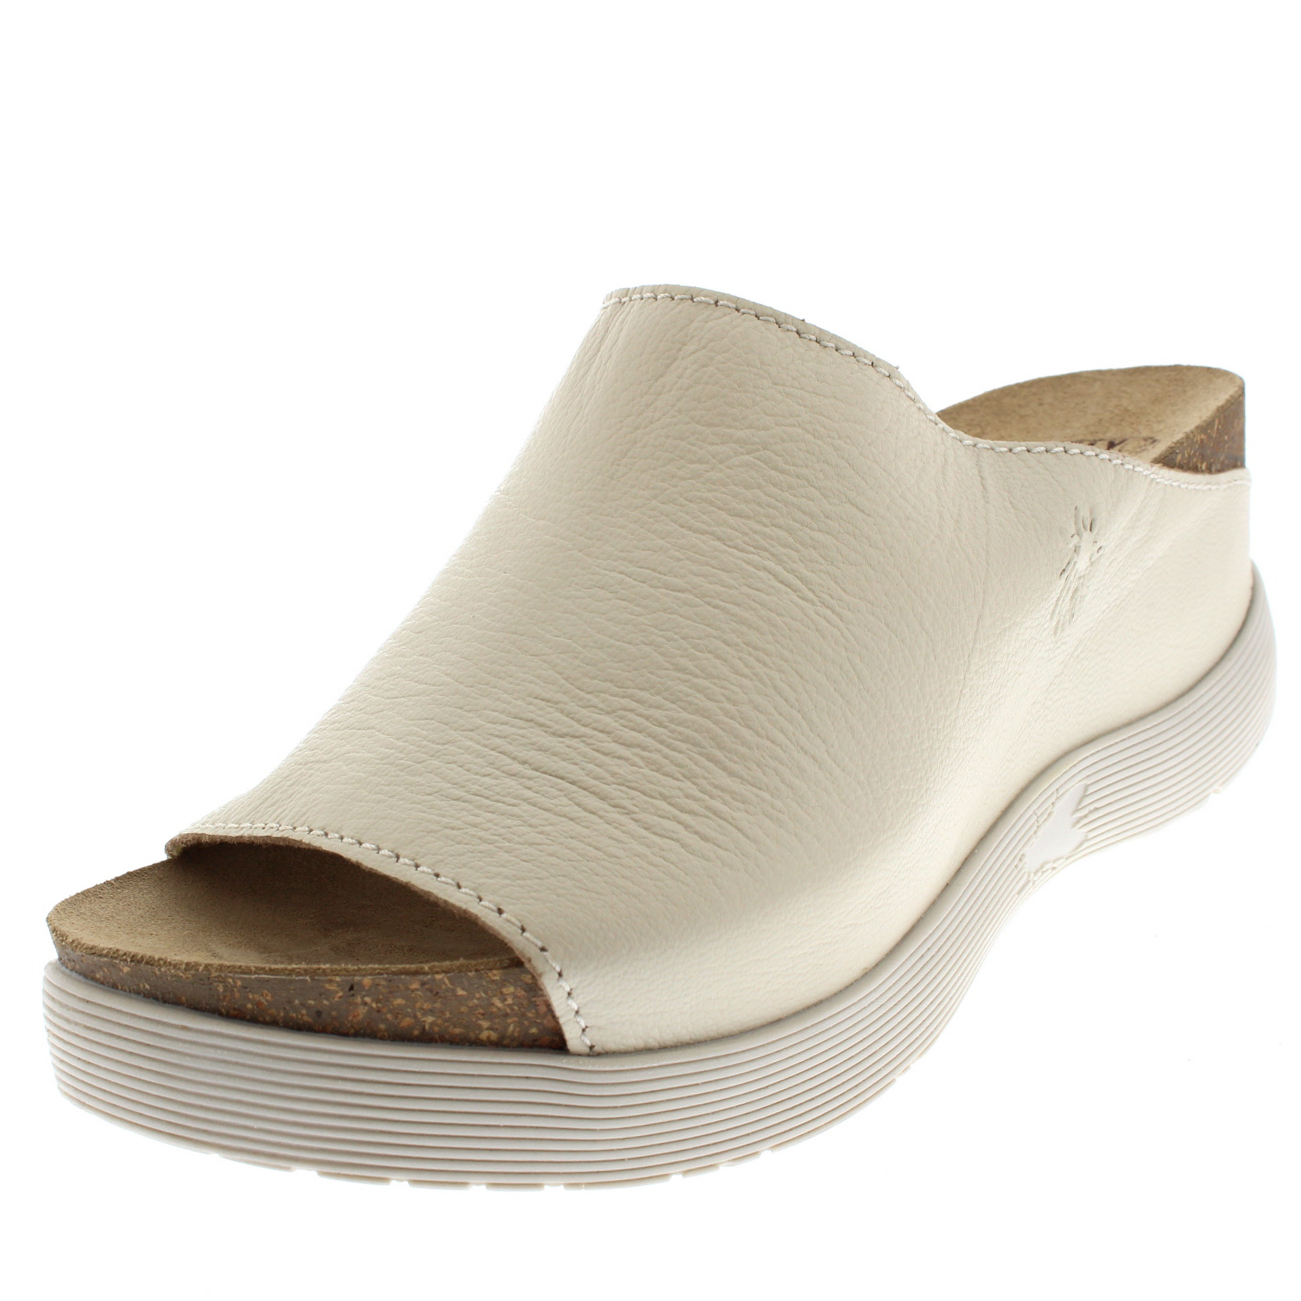 Damenschuhe Fly London Wigg Mousse Leder Open Toe UK Mules Wedge Heel Sandales UK Toe 3-9 24544a